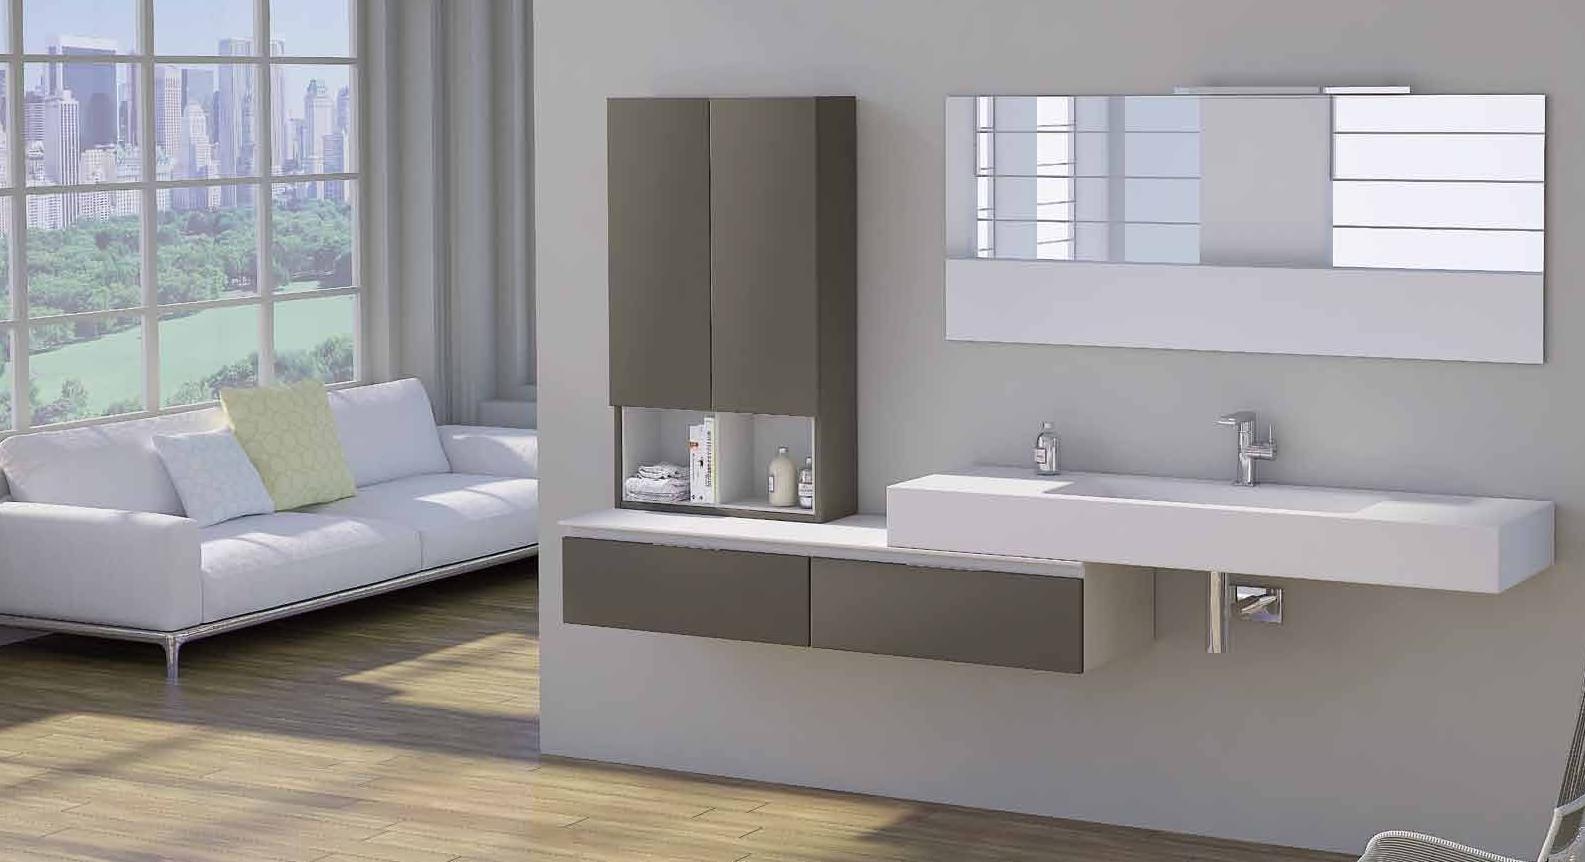 Mueble de baño Kyrya colección 2014 - Modelo D20 ... - photo#24